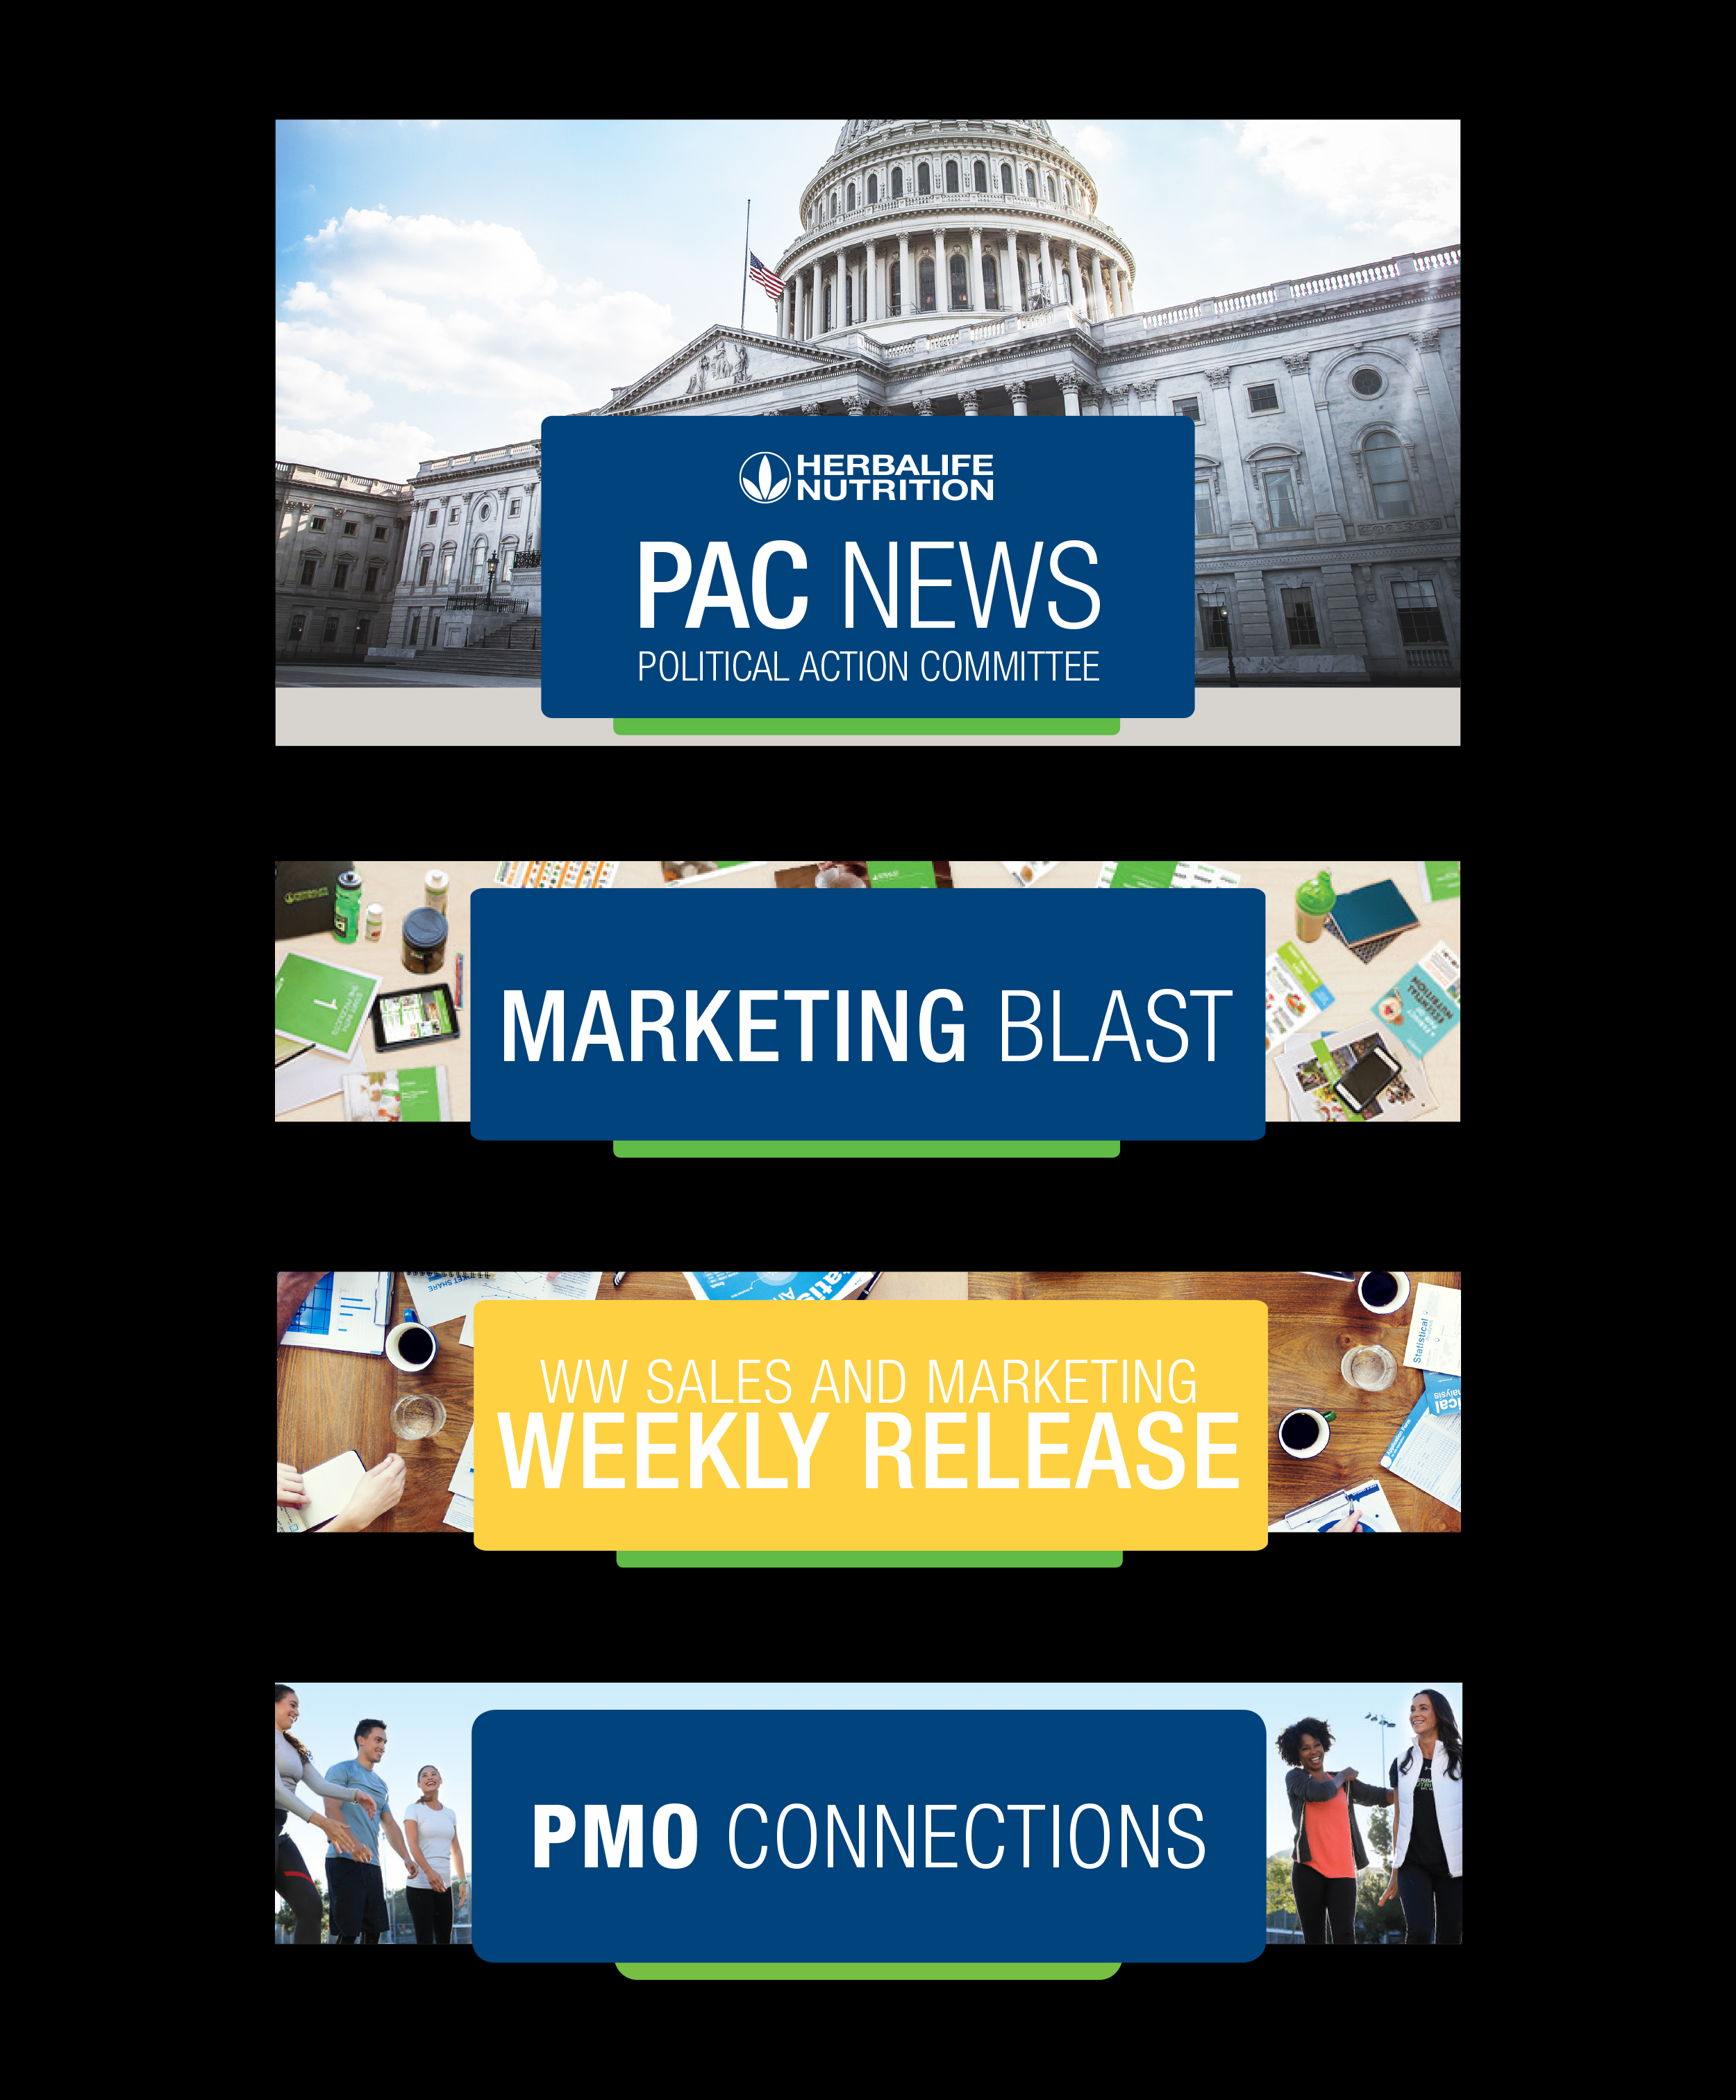 Email blast & website header banners. Photoshop & InDesign CC.